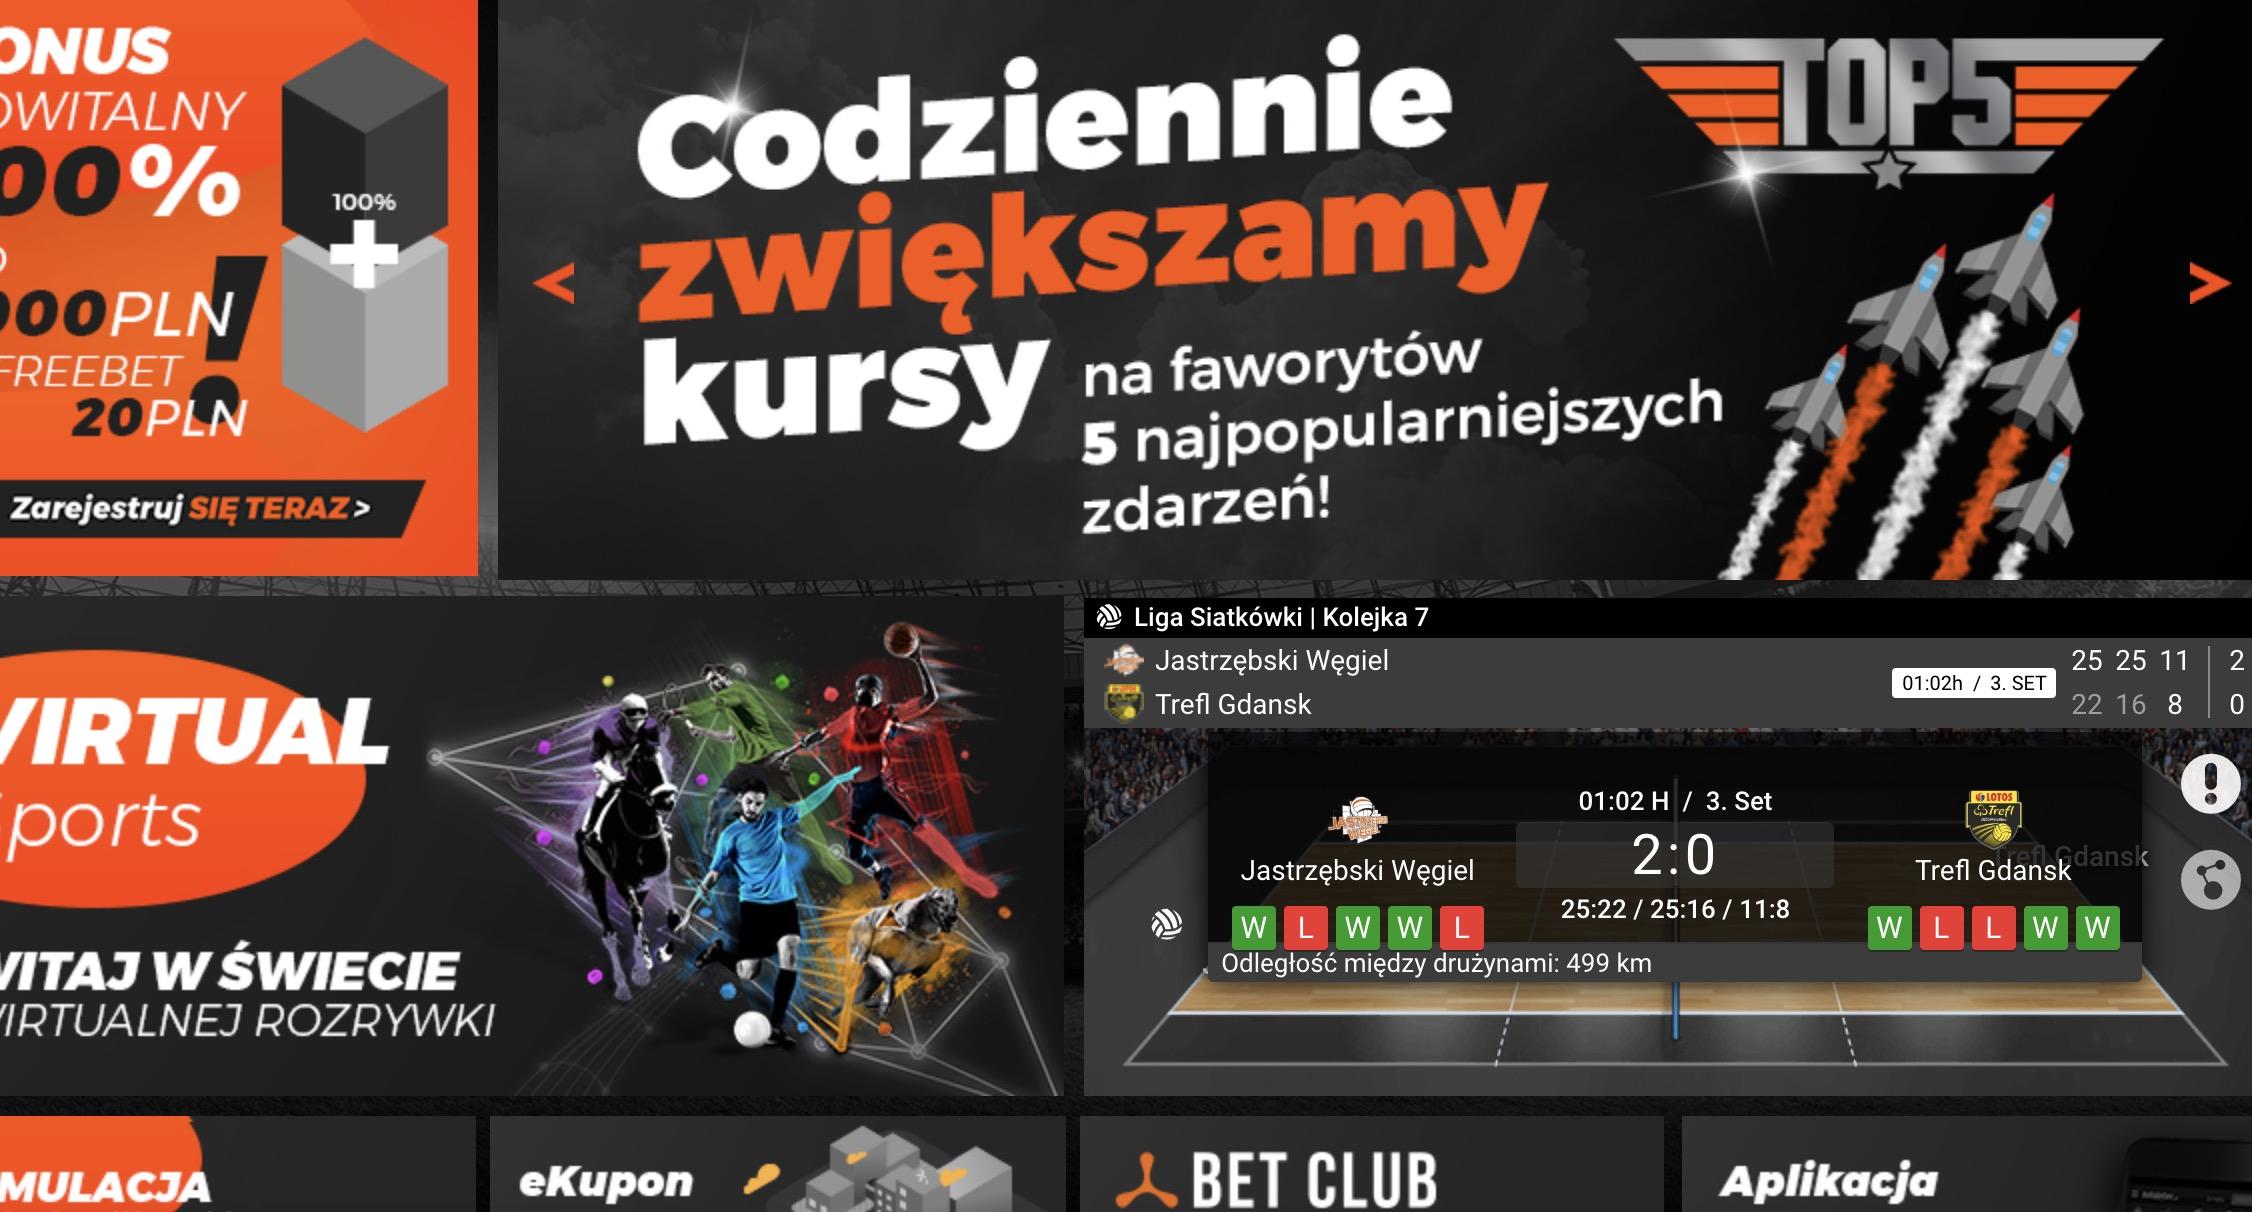 Totolotek a licencja bukmacherska w Polsce